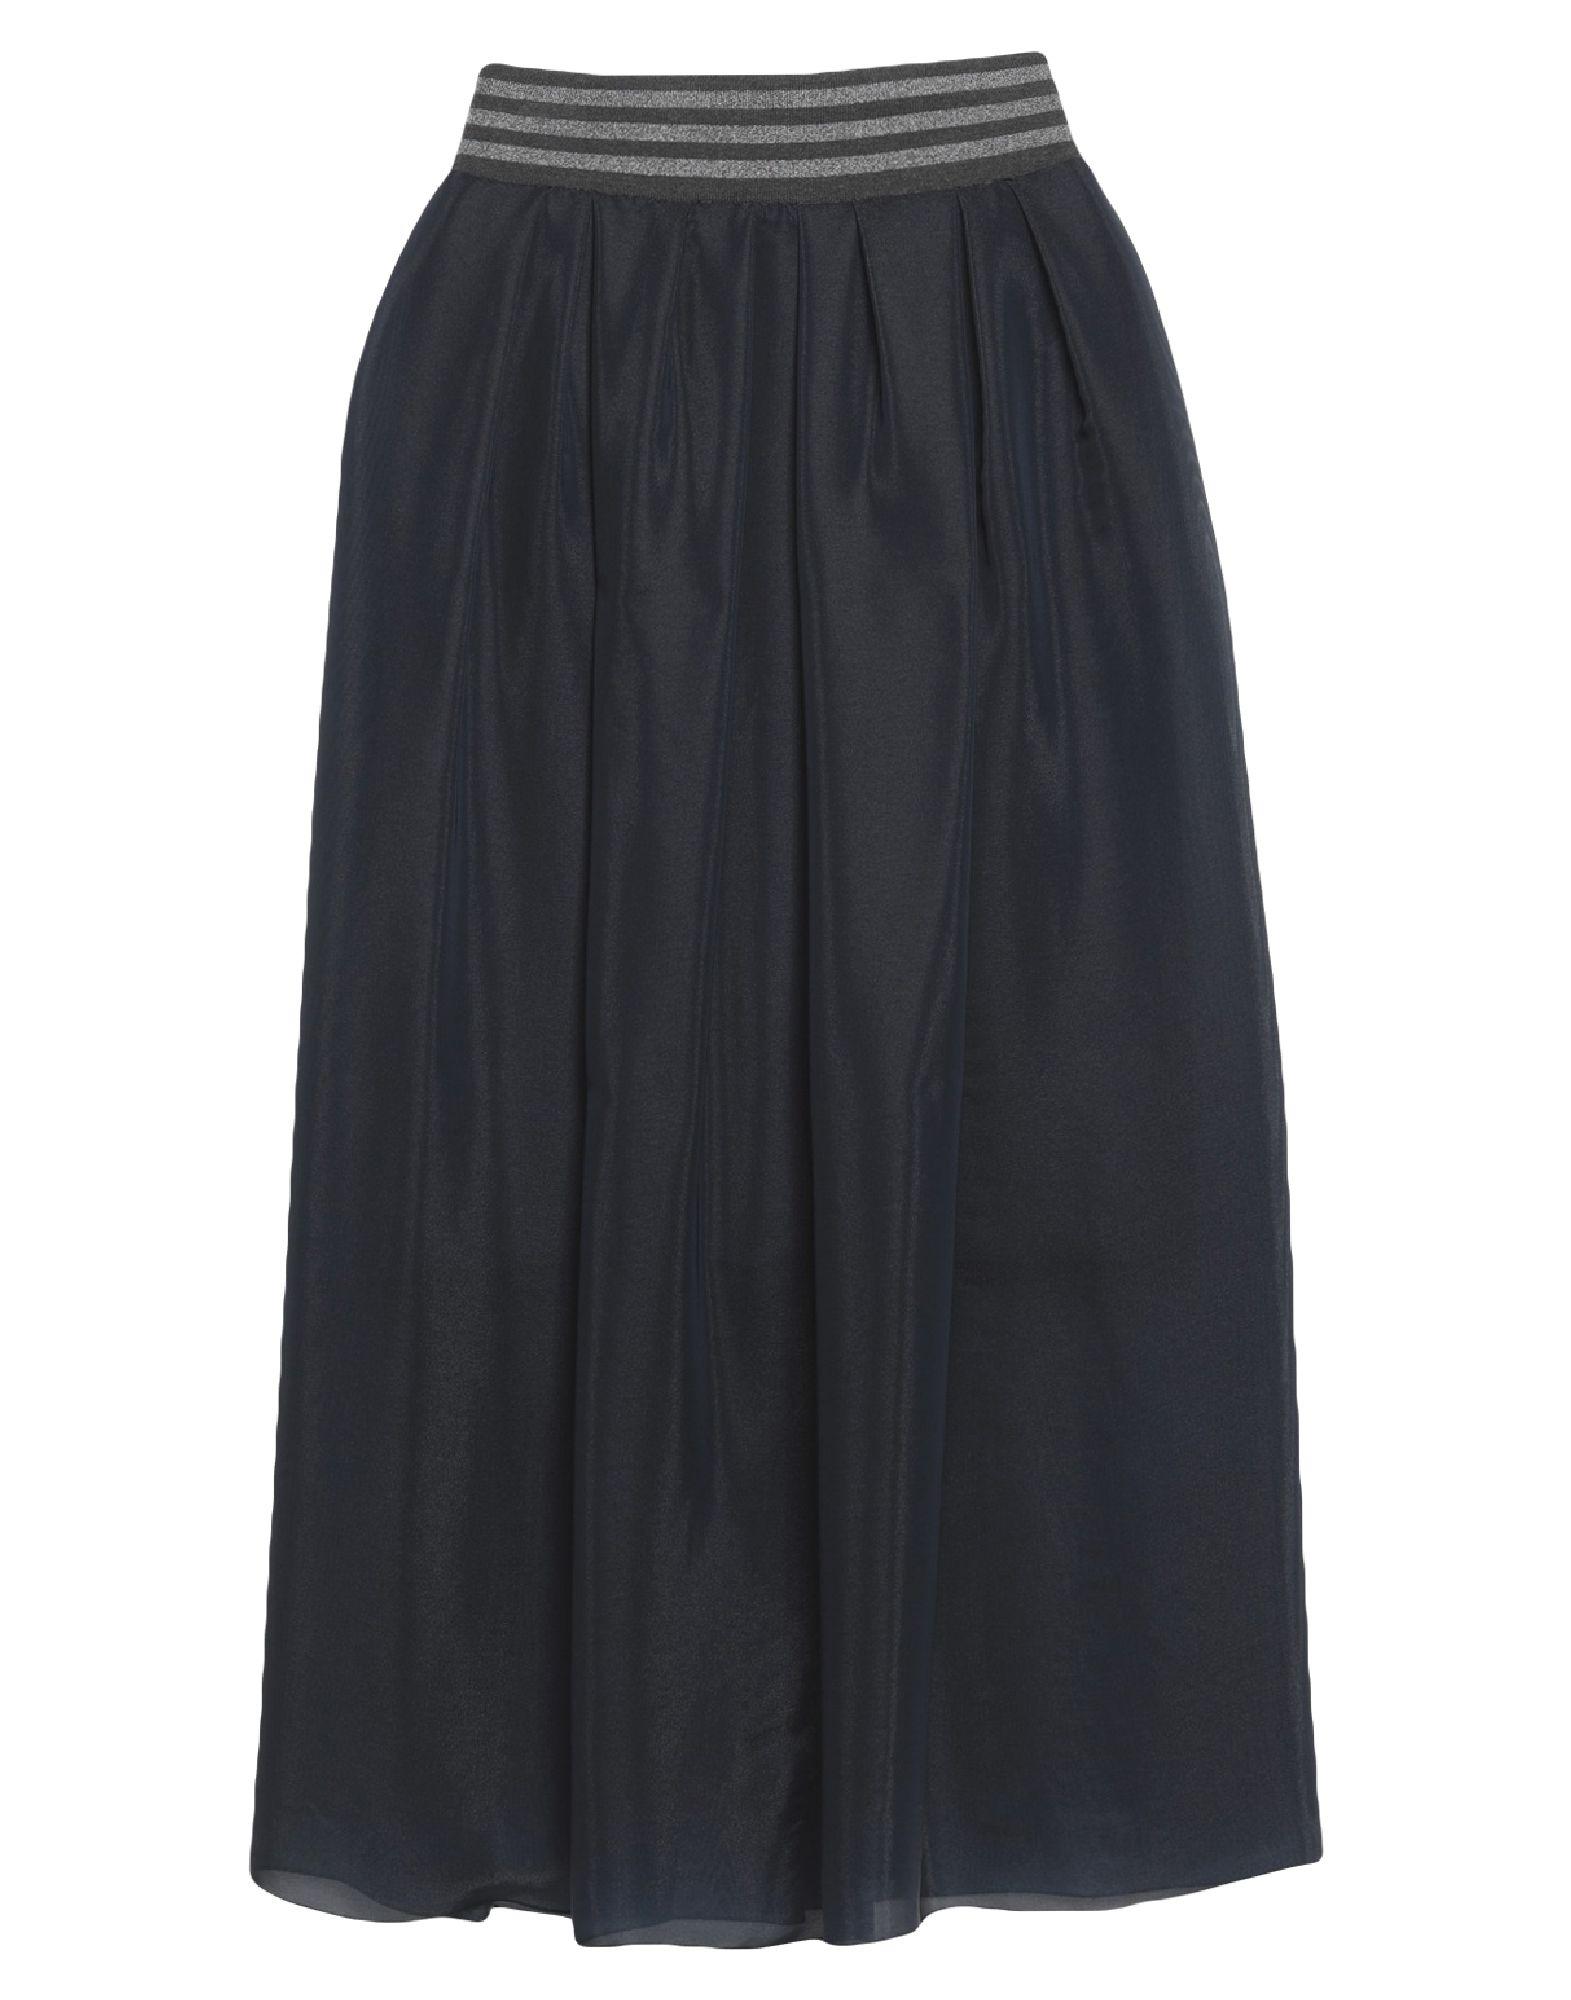 ELEVENTY Long skirts. knitted, organza, lamé, folds, solid color, elasticized waist, no pockets, rear closure, zipper closure, semi-lined, stretch. 84% Viscose, 9% Elastane, 7% Polyamide, Silk